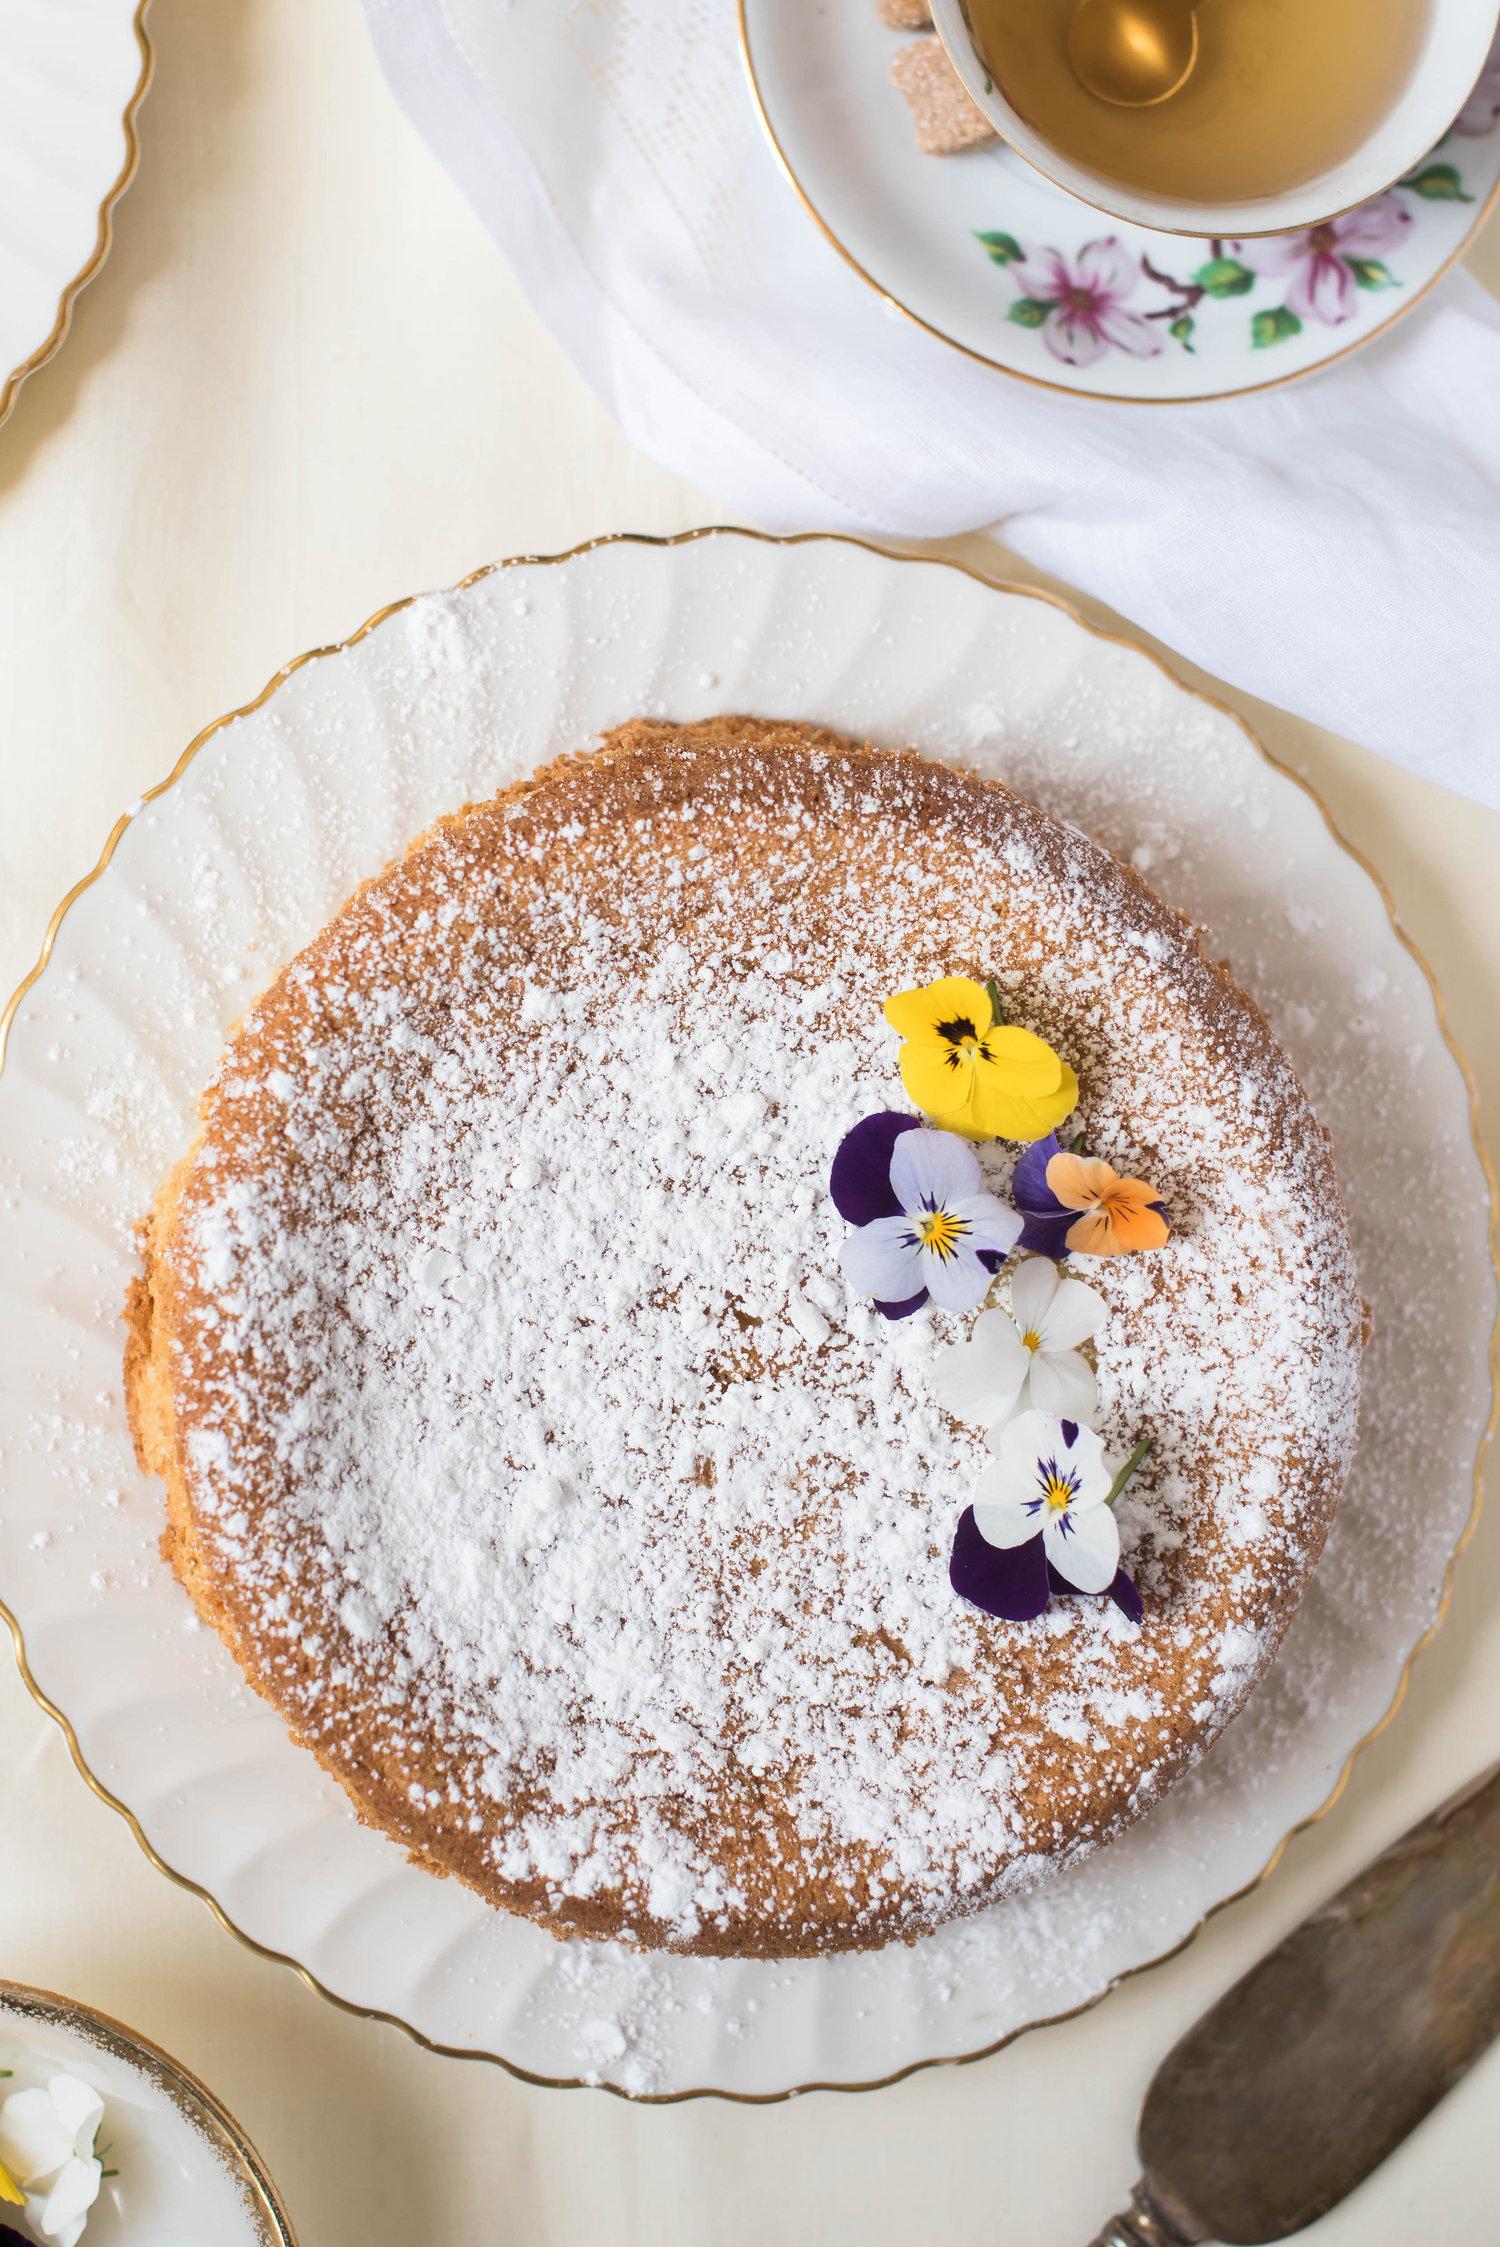 ROSE+&+IVY+Journal+Spring+Celebrations+Lemon+Almond+Cake.jpeg